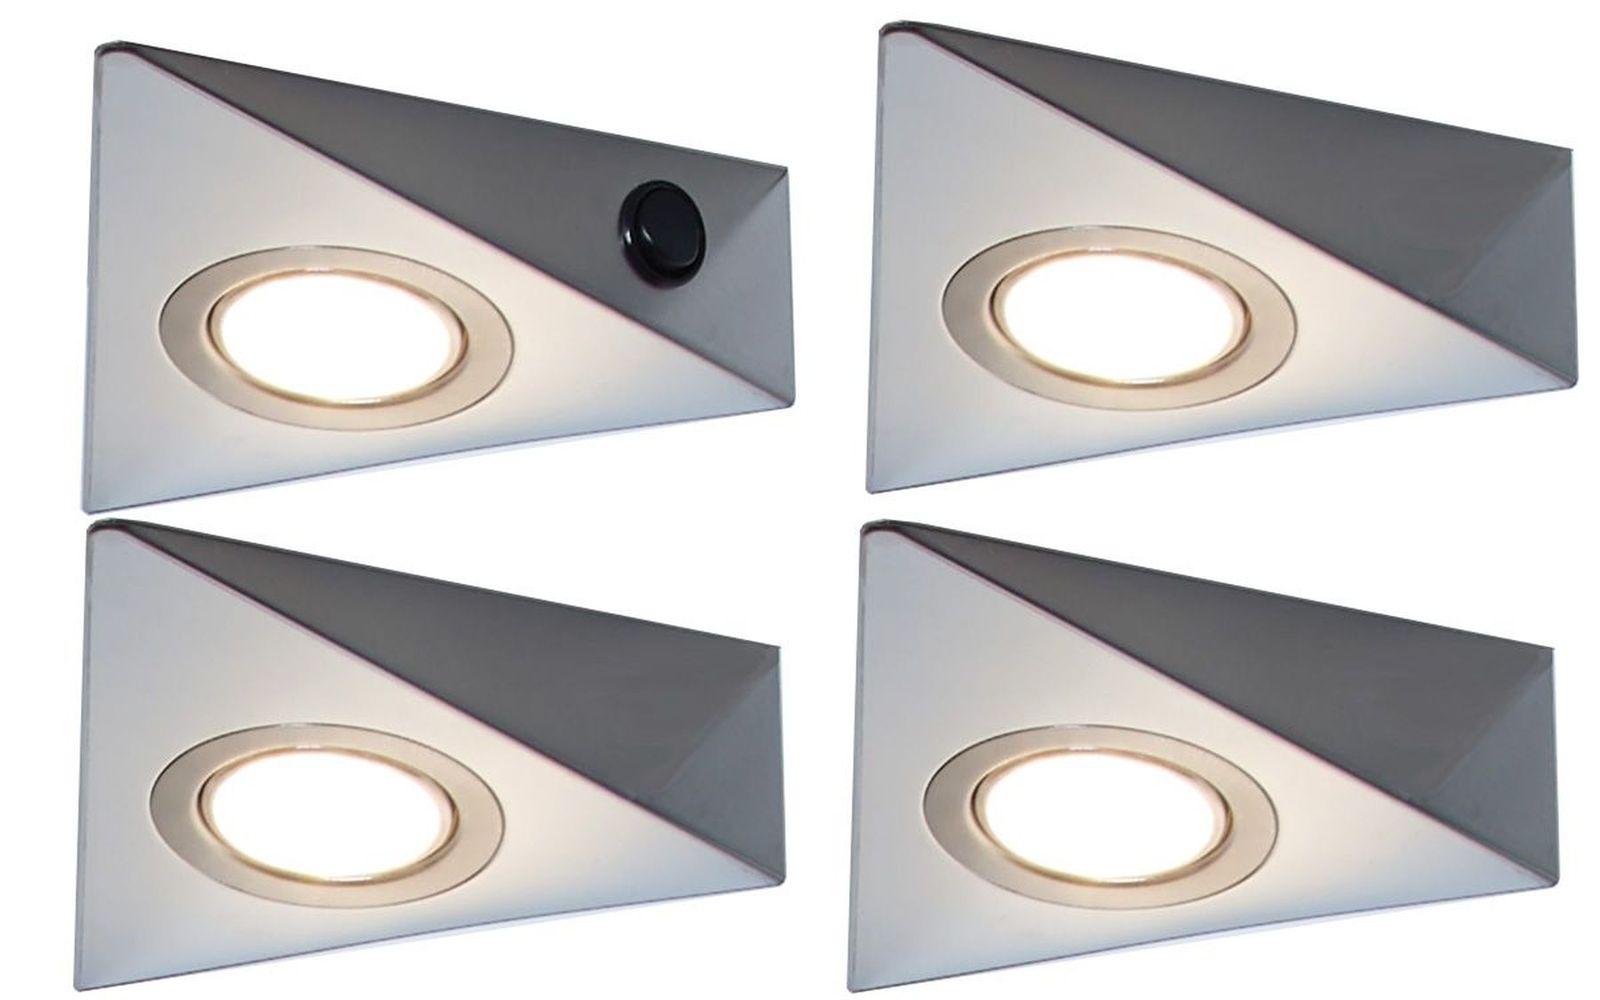 LED 4-er Set Dreieck Küchen Unterbauleuchte 4 x 3 Watt Lampenset ...